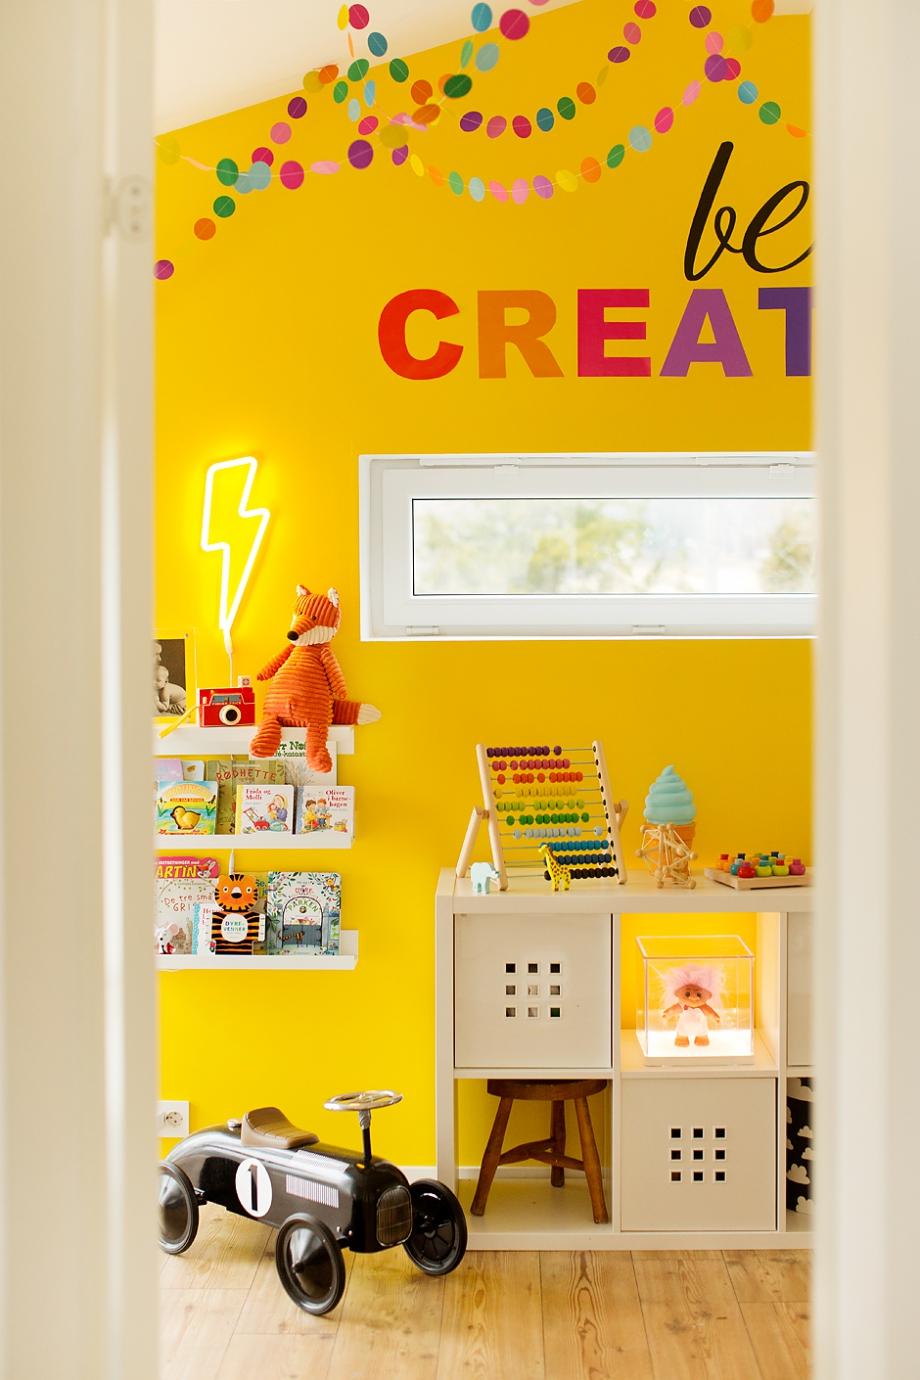 interiør-barnerom-blogg-kidsroom-pastell-fargerikt-haslien-foto-inspirasjon-unisex-barneinteriør_01